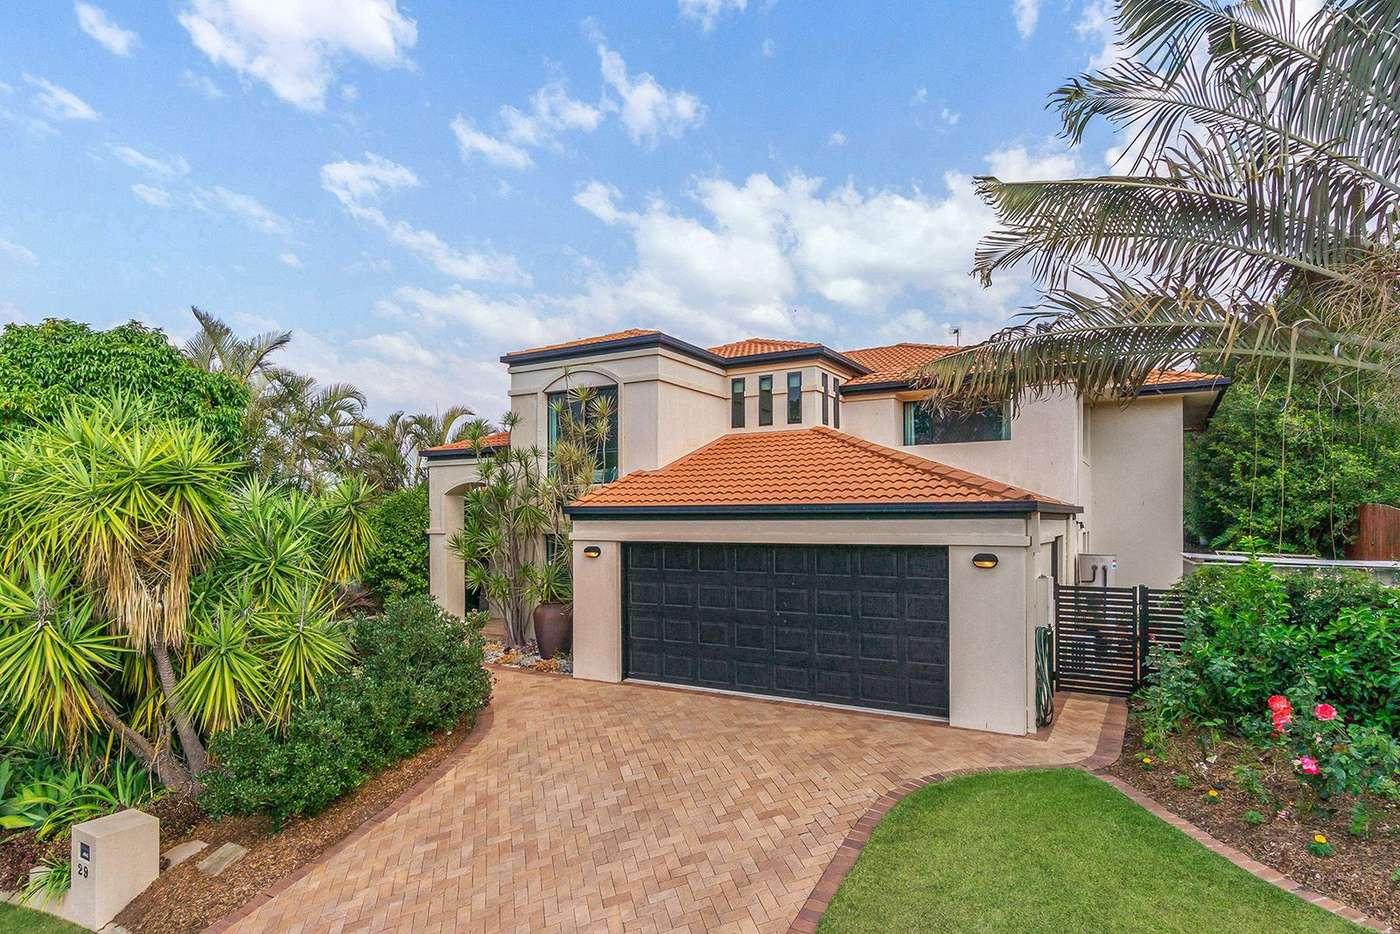 Main view of Homely house listing, 29 Casuarina Street, Bridgeman Downs QLD 4035